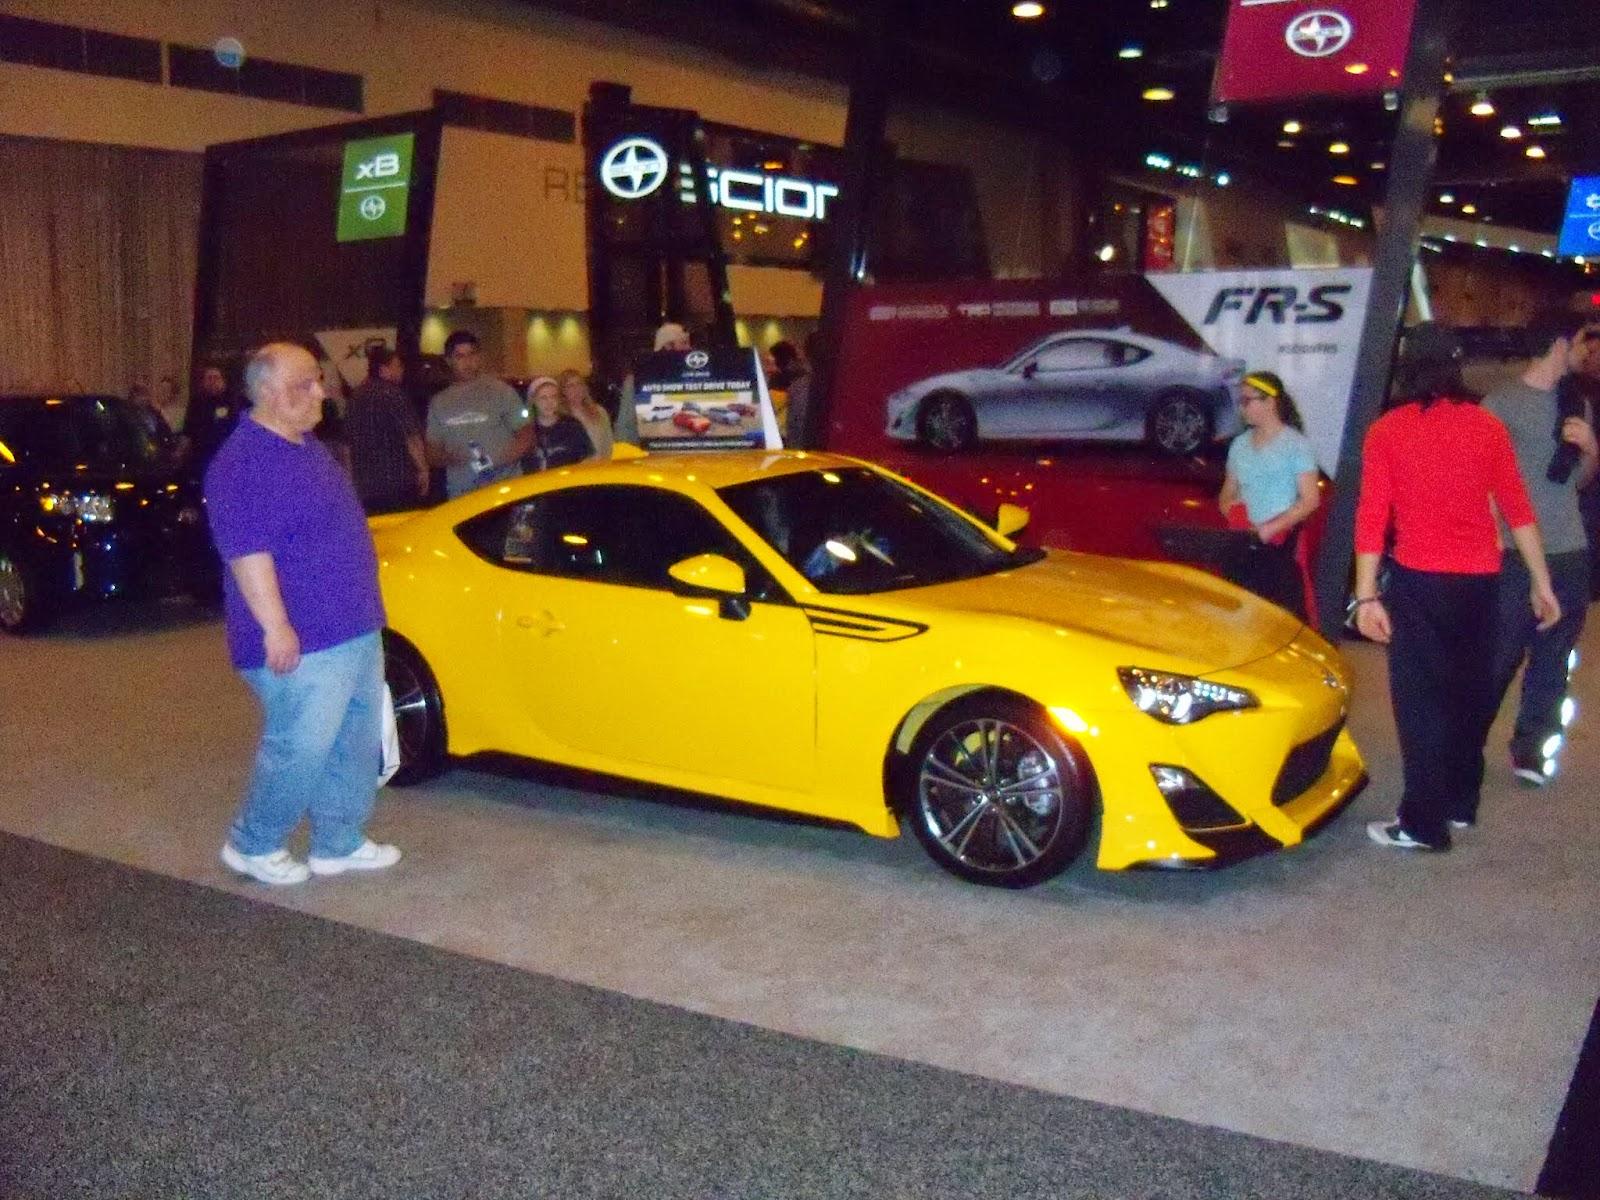 Houston Auto Show 2015 - 116_7351.JPG